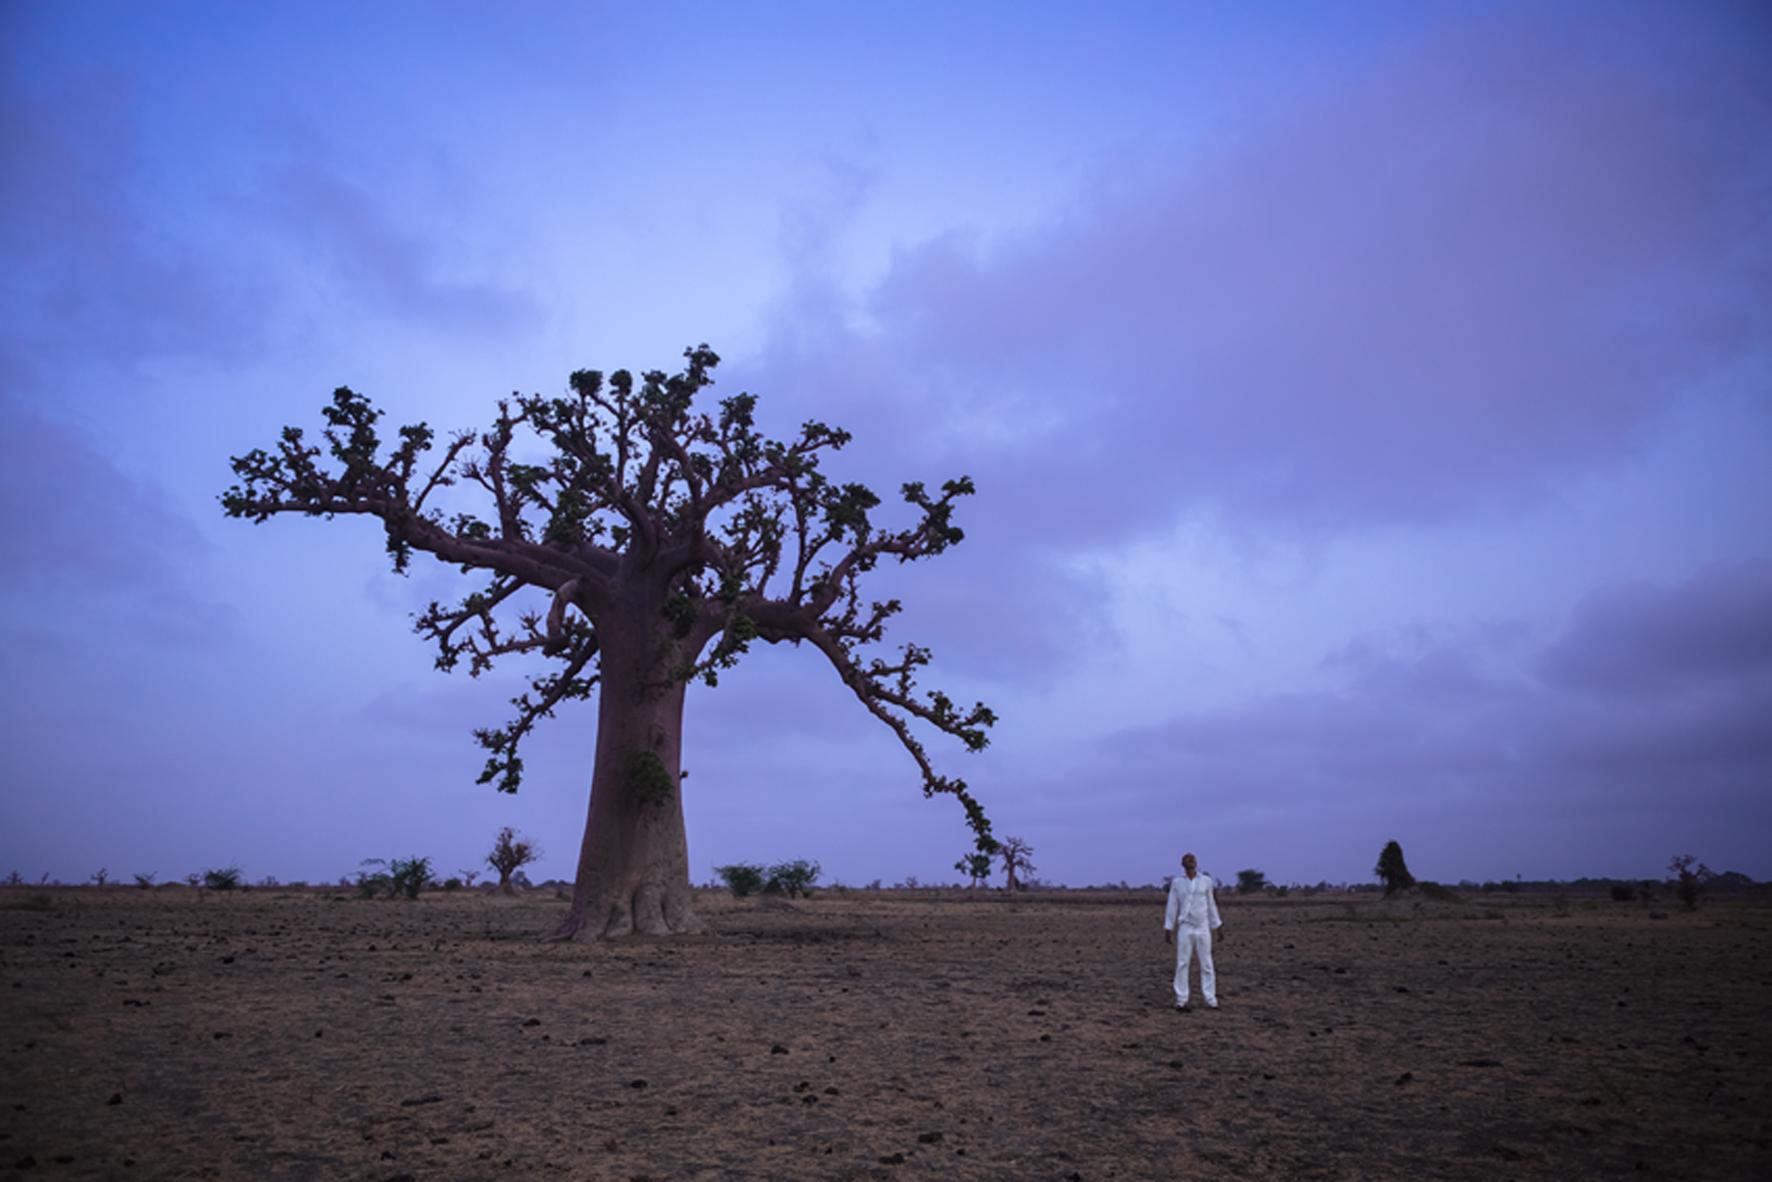 Ayrson Heráclito_História do Futuro- Baobá- o capítulo da agromancia_2014_da série Mitologias Africanas_Blau Projects.jpg.meno